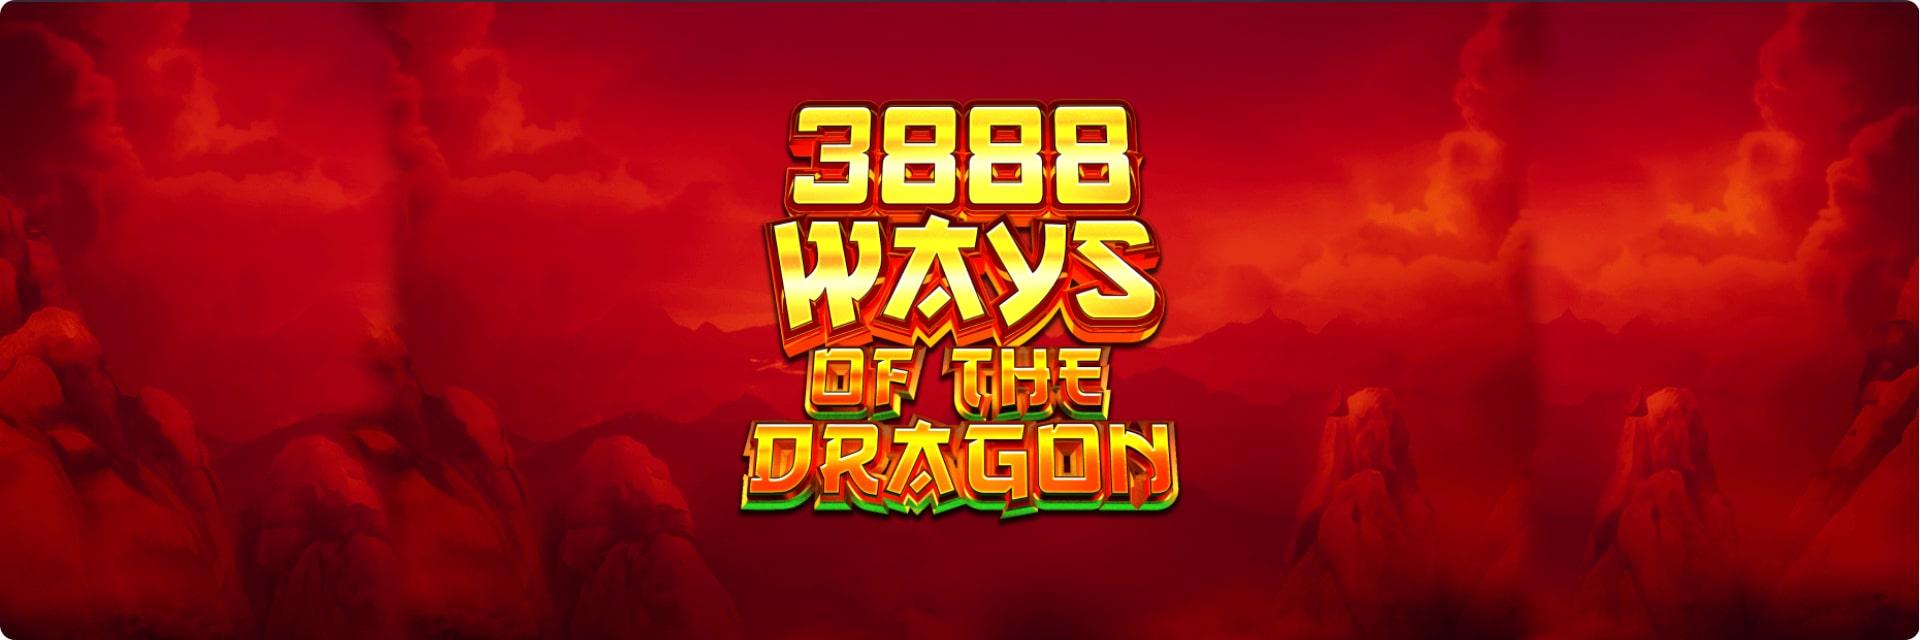 3888 ways of the dragon asian slot.